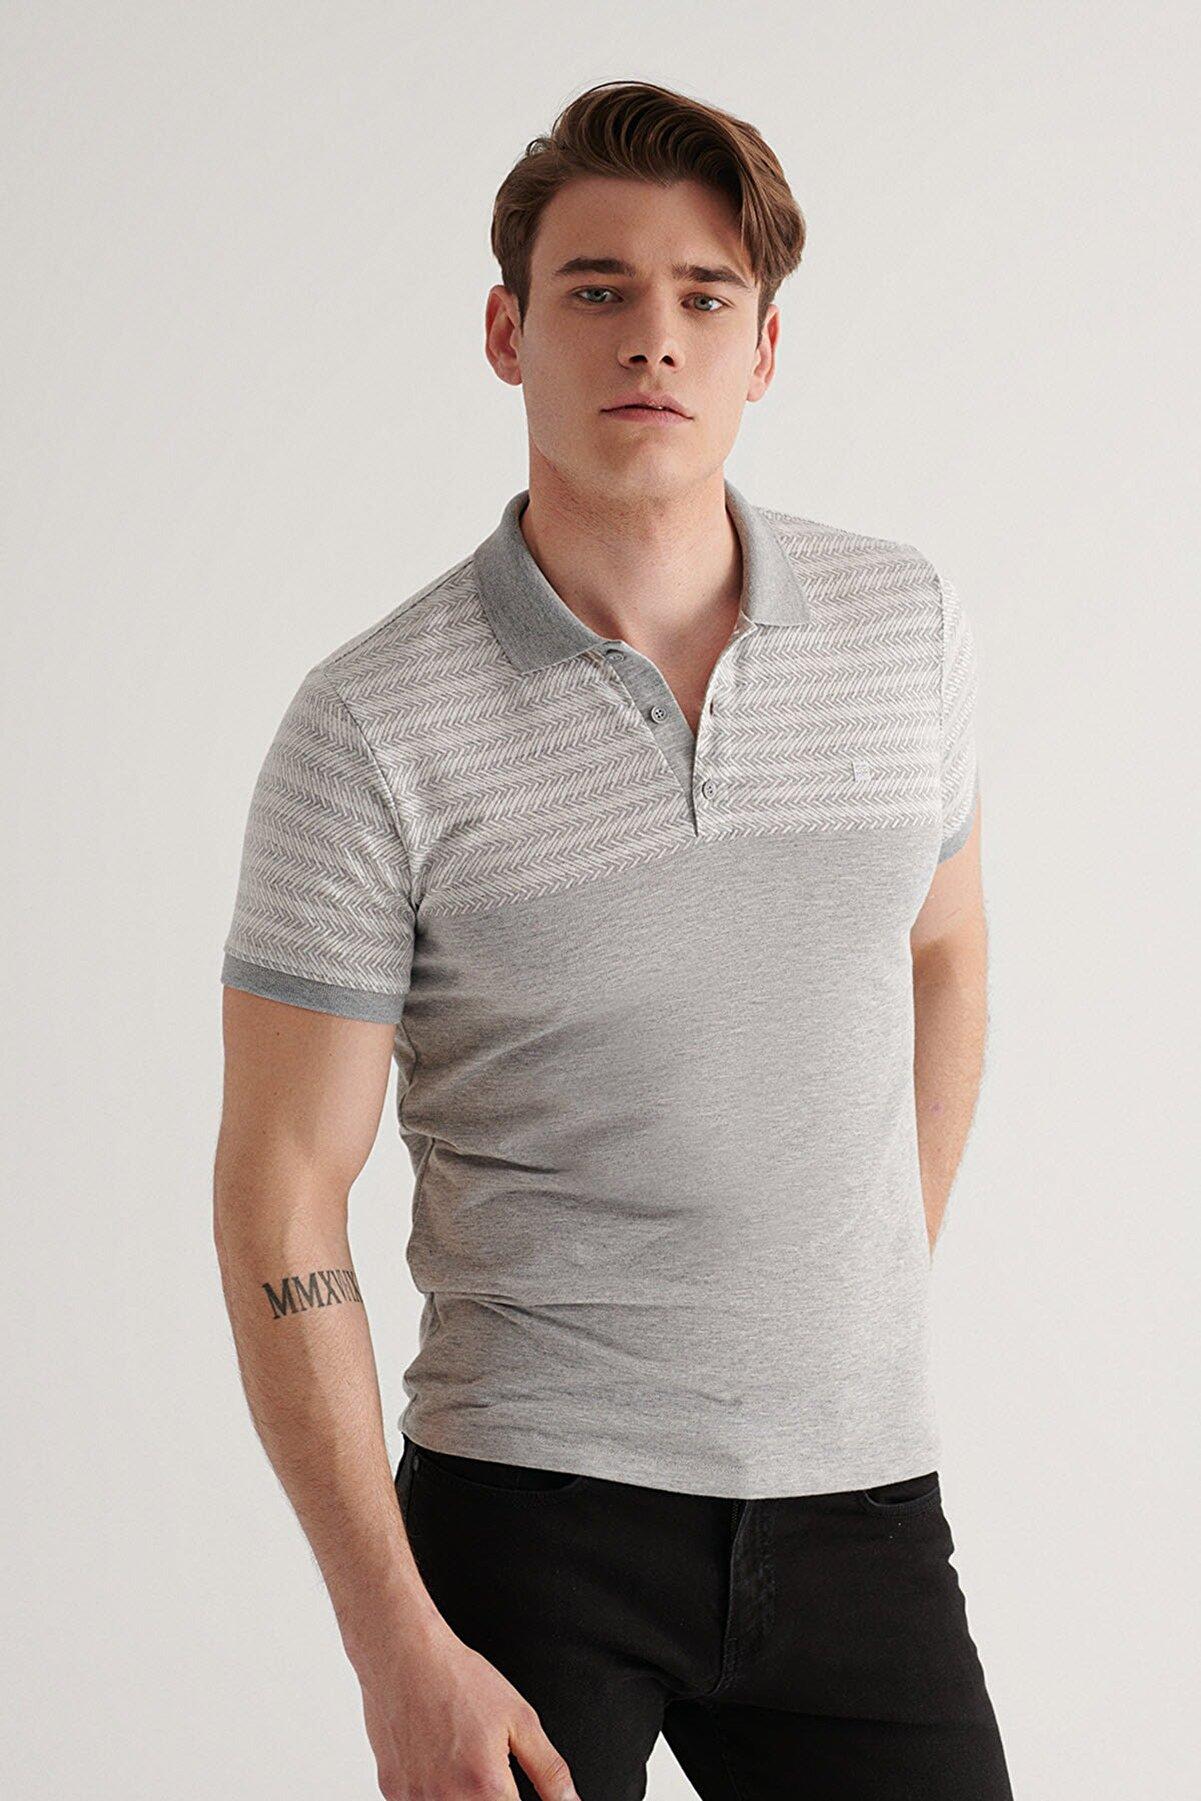 Avva Erkek Gri Polo Yaka Jakarlı T-shirt A11y1080